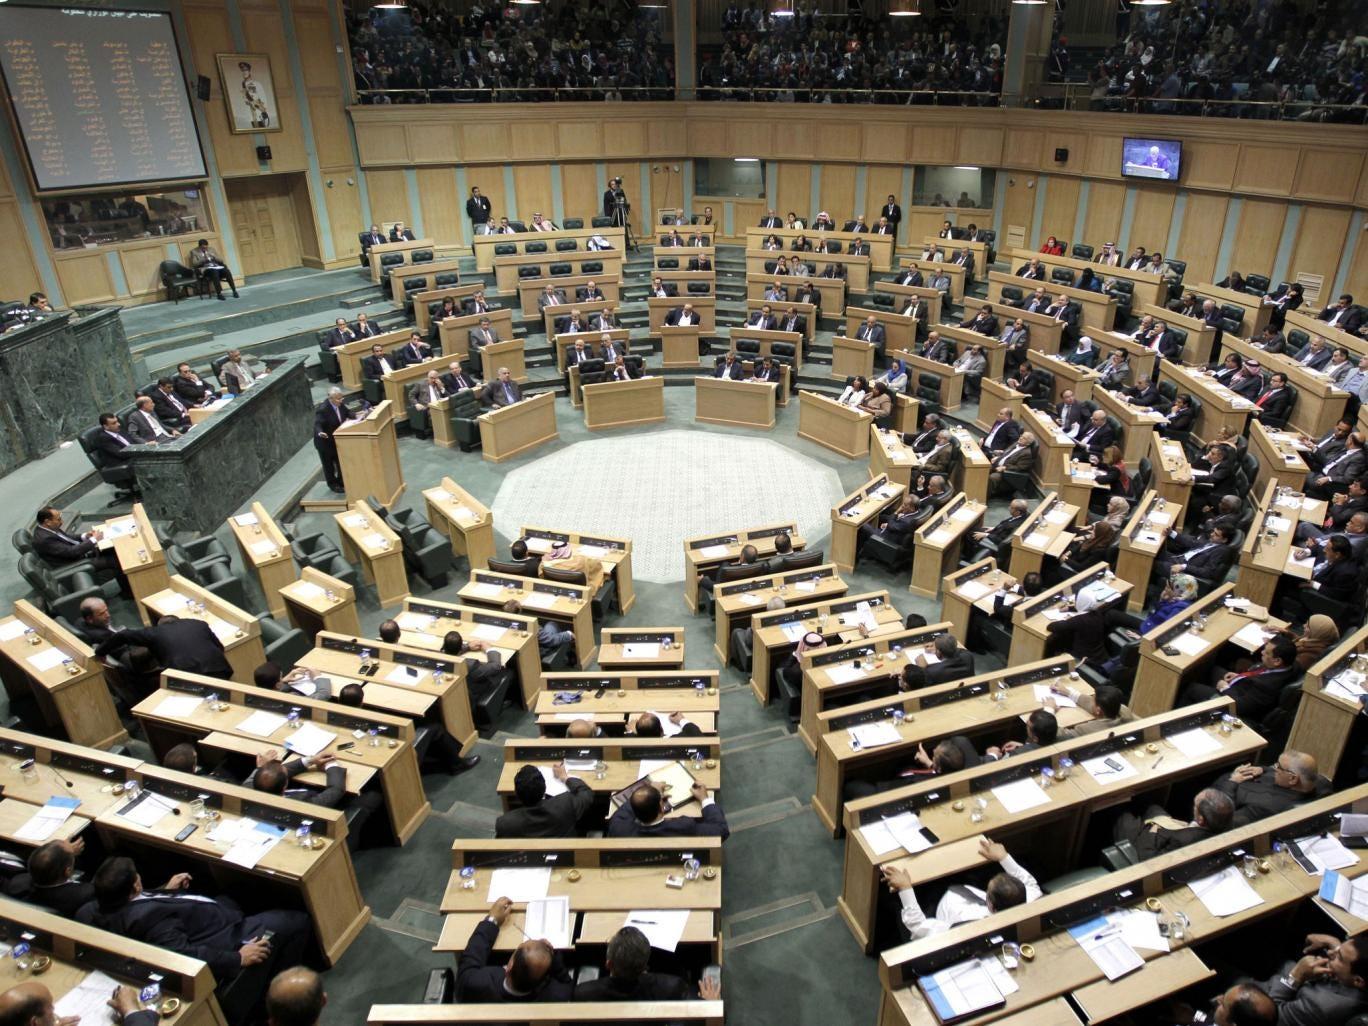 Jordan's parliament in session